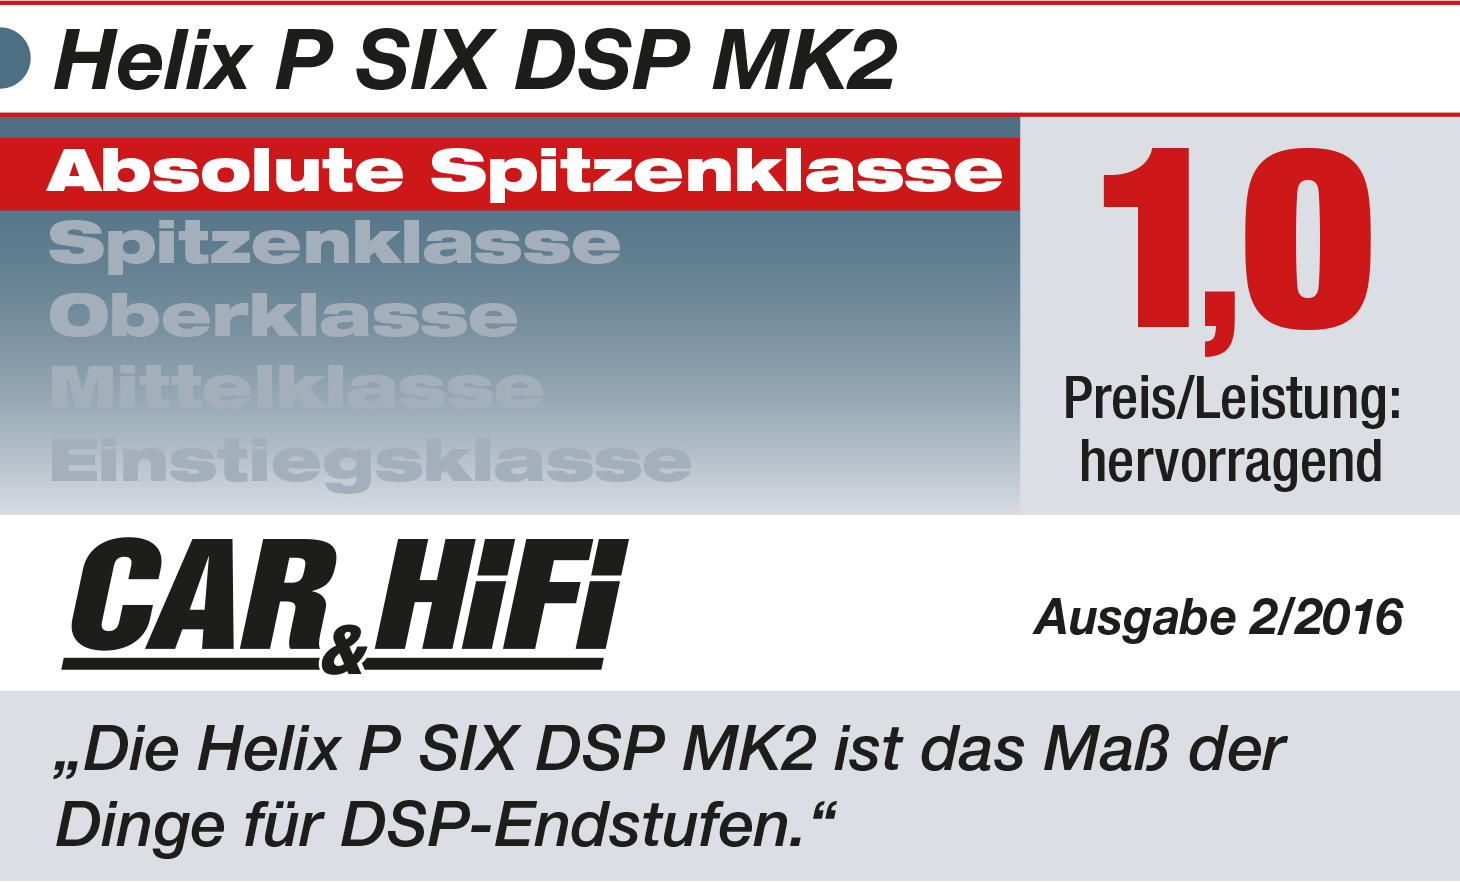 HELIX_P-SIX_DSP_MK2_CAR-Hifi_201602